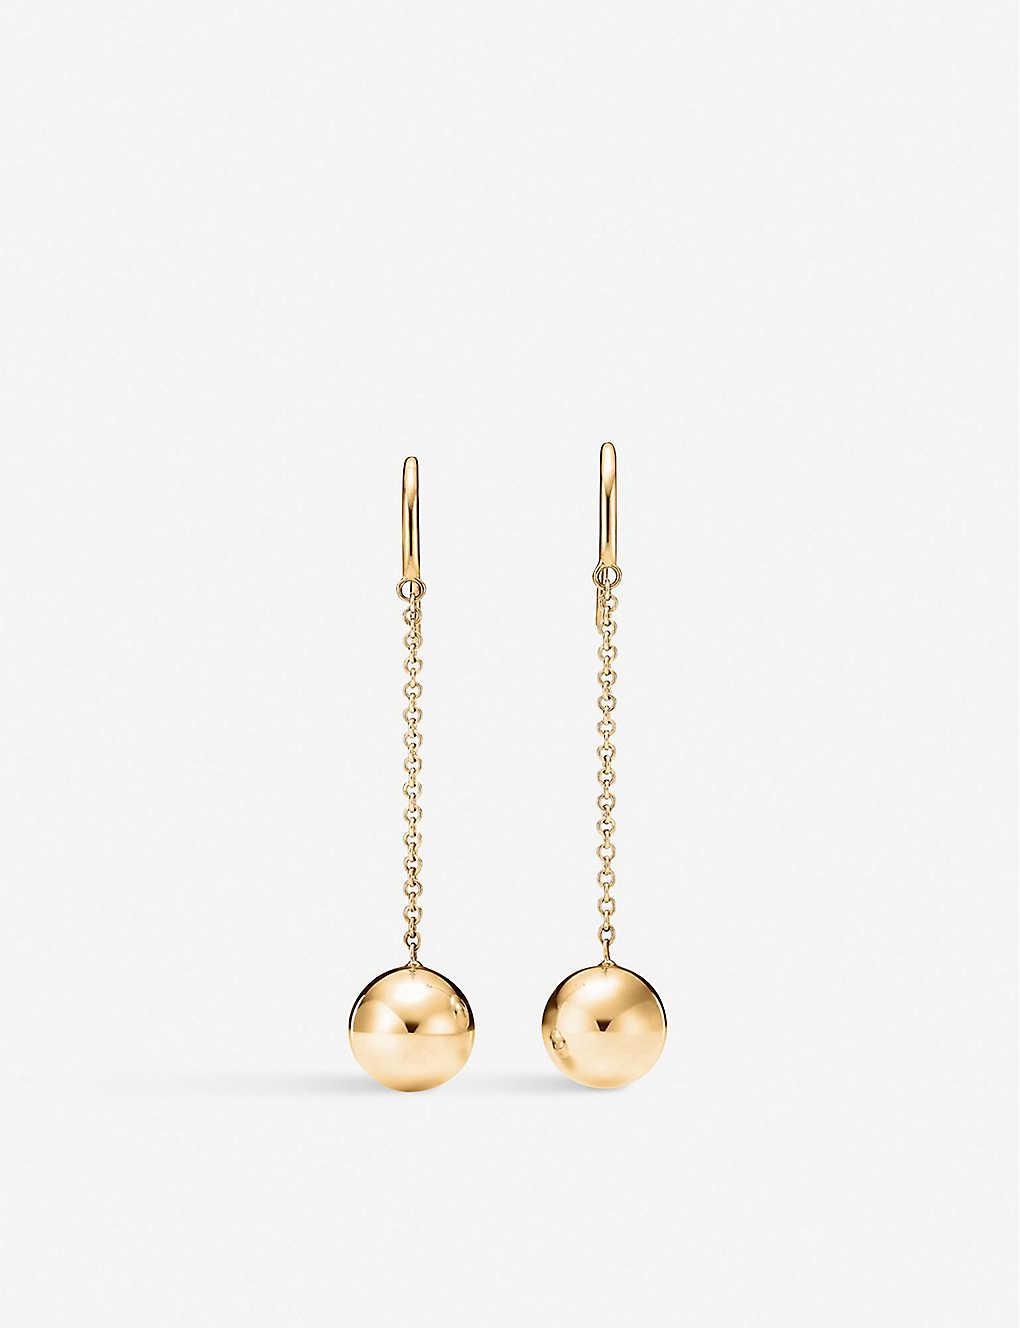 2c326bafb TIFFANY & CO - Tiffany City HardWear Ball Hook 18k gold earrings ...